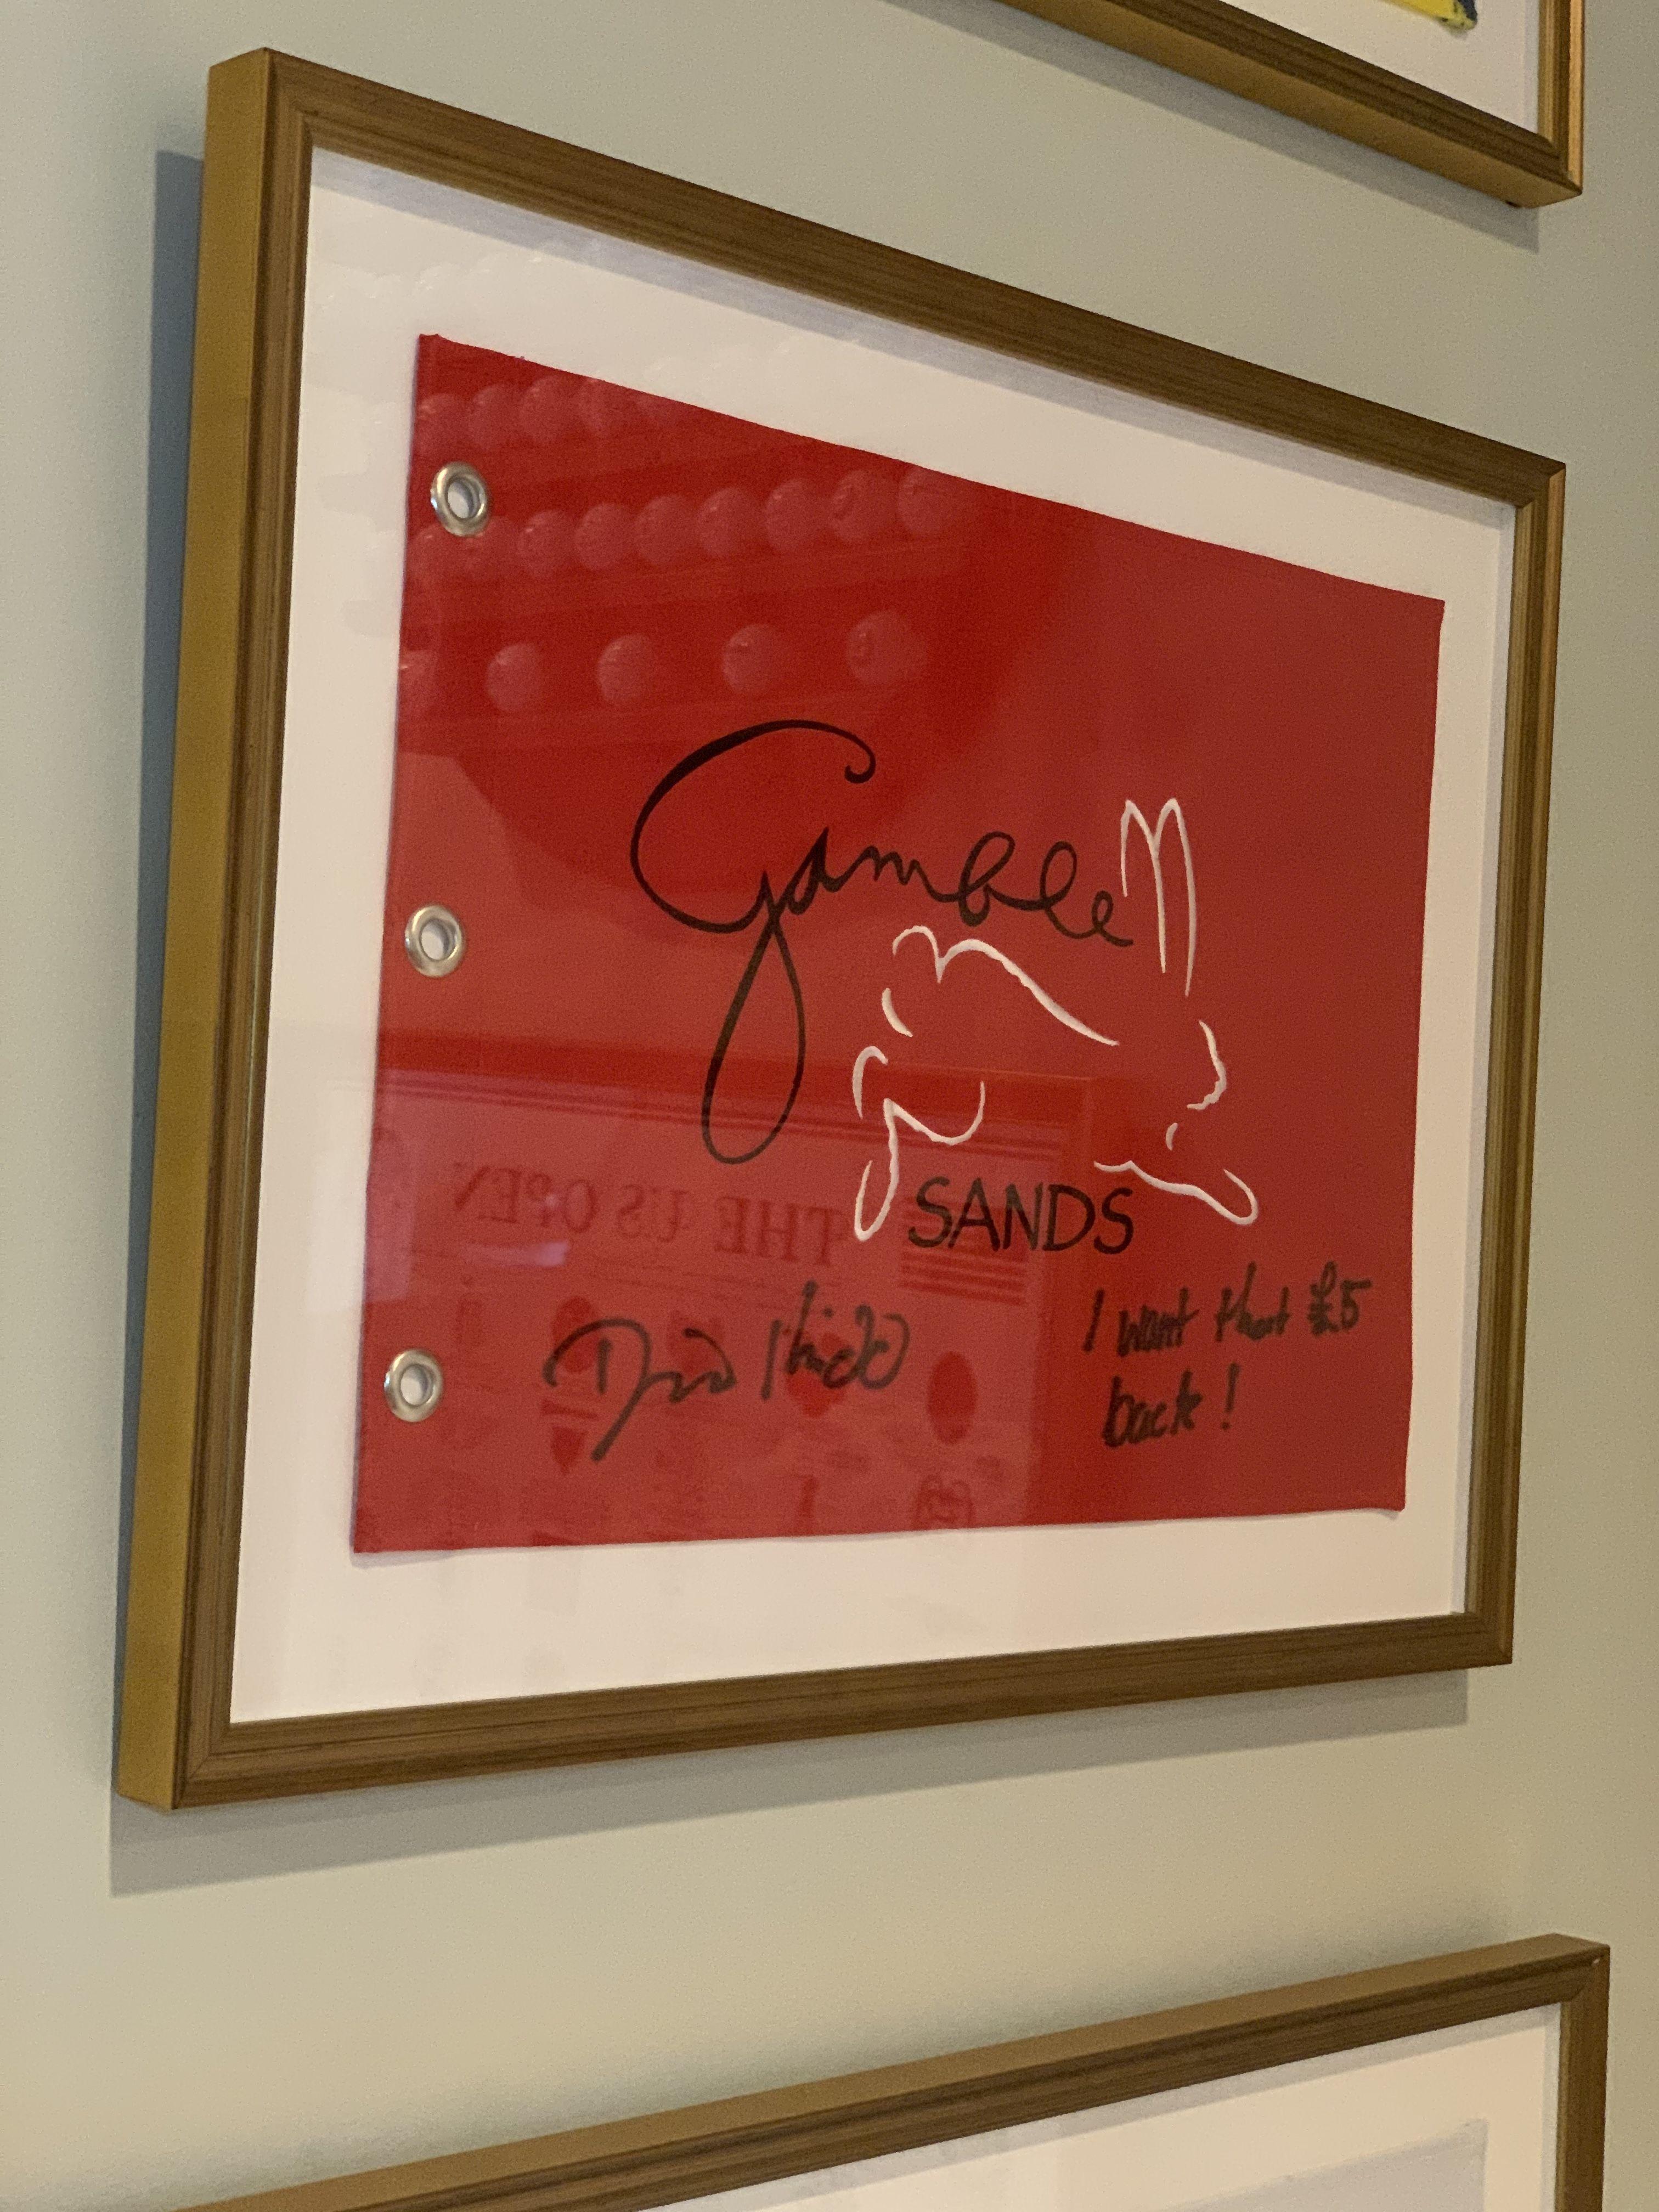 framed, signed golf flag